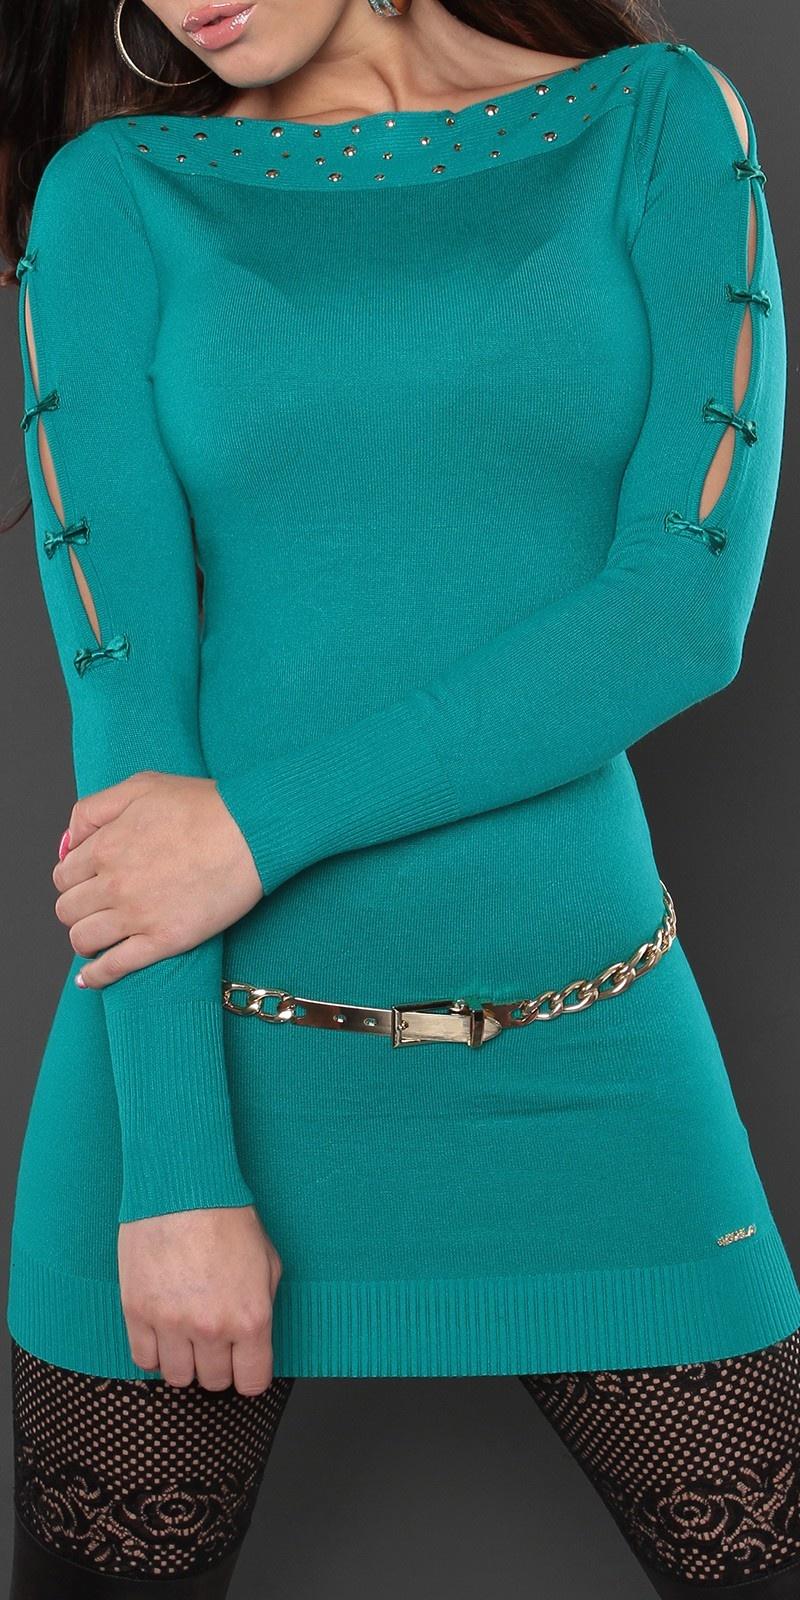 Sexy lange sweater-trui met strikjes saffierblauw